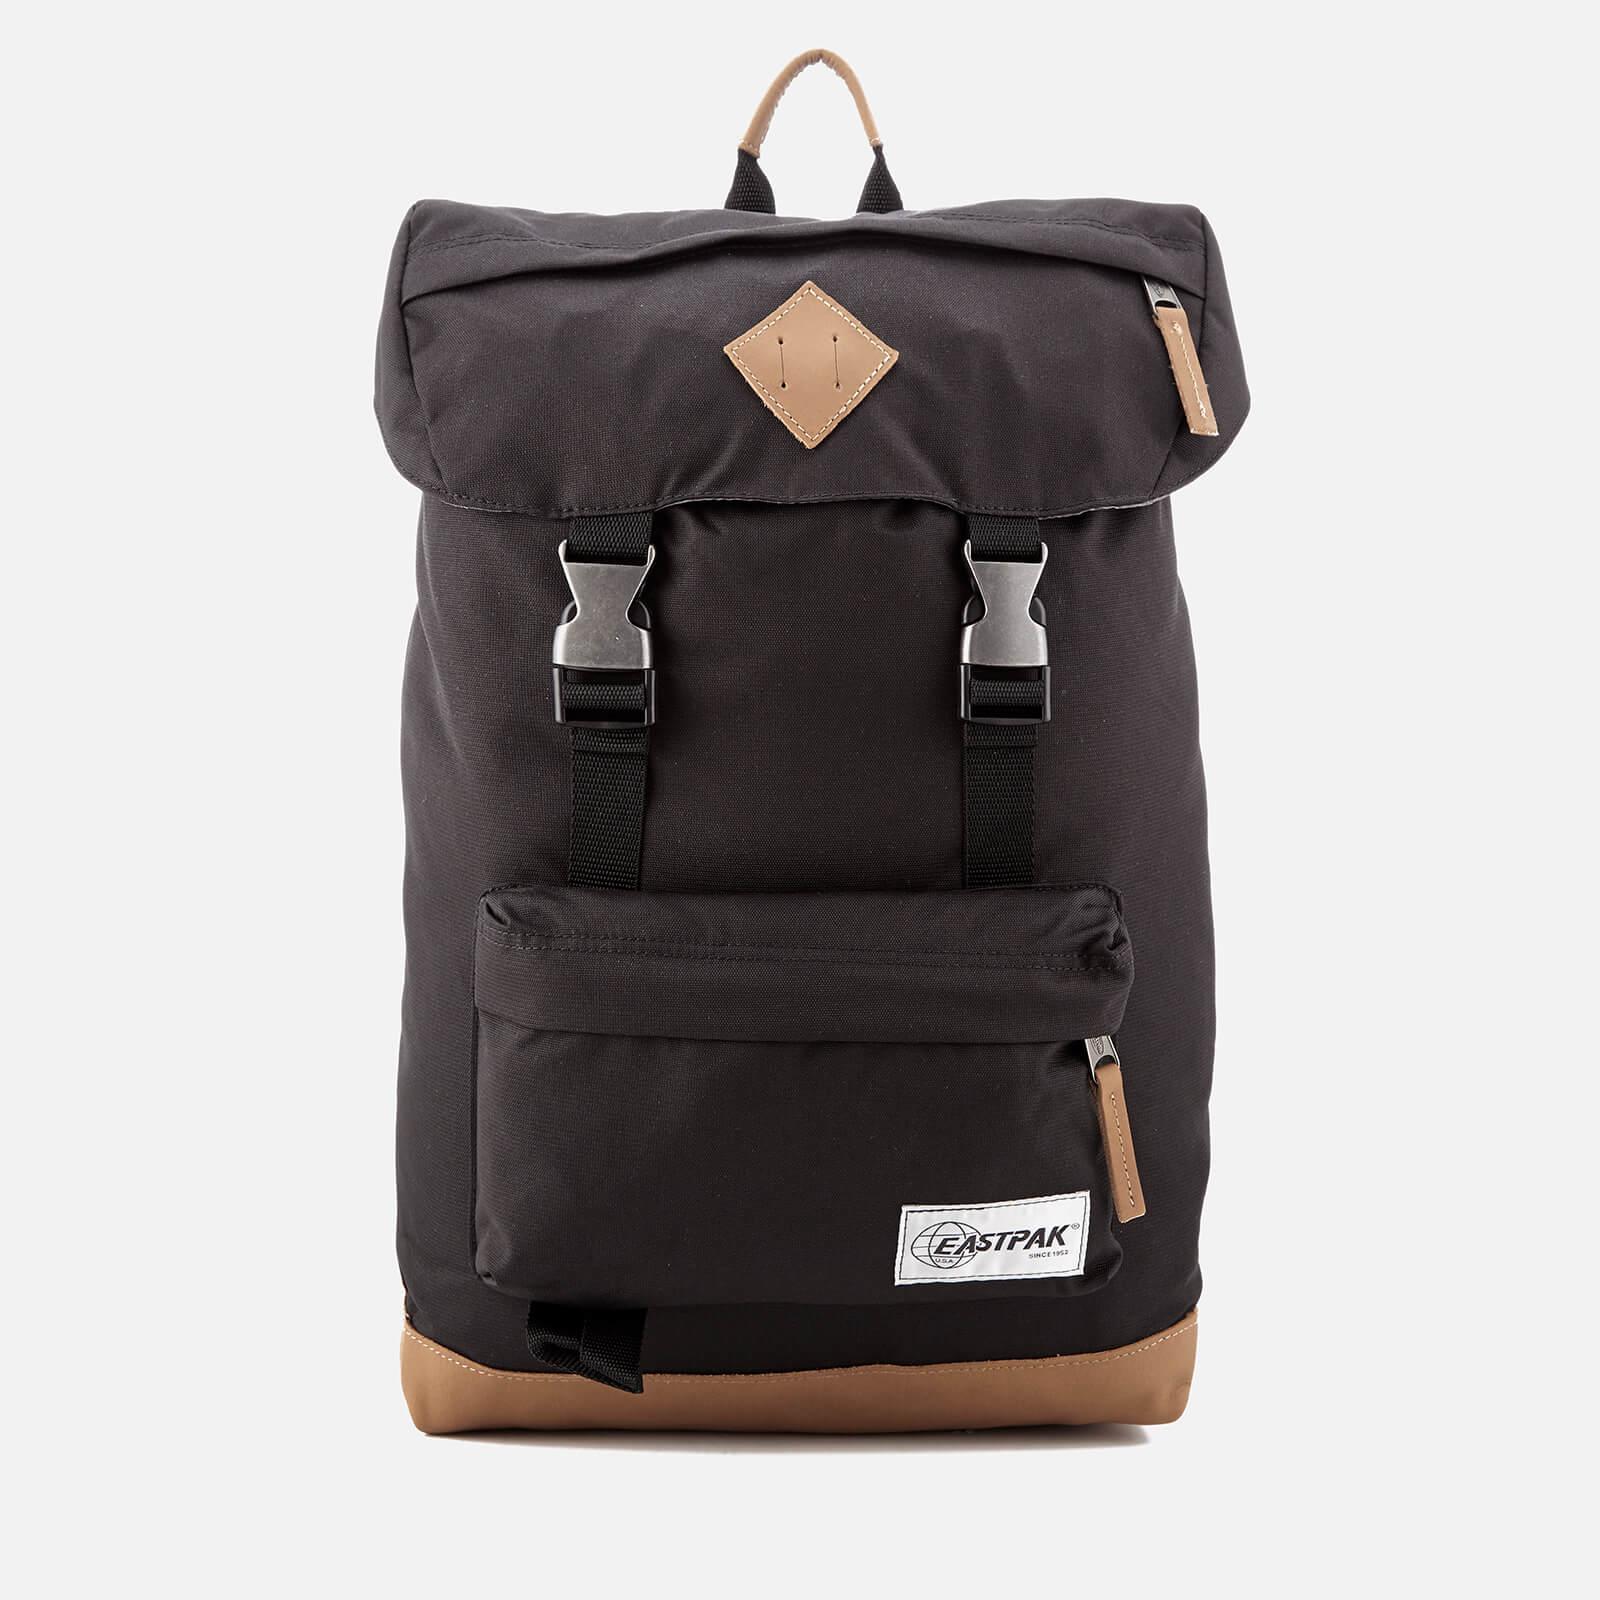 Eastpak Rowlo Backpack - Into Black